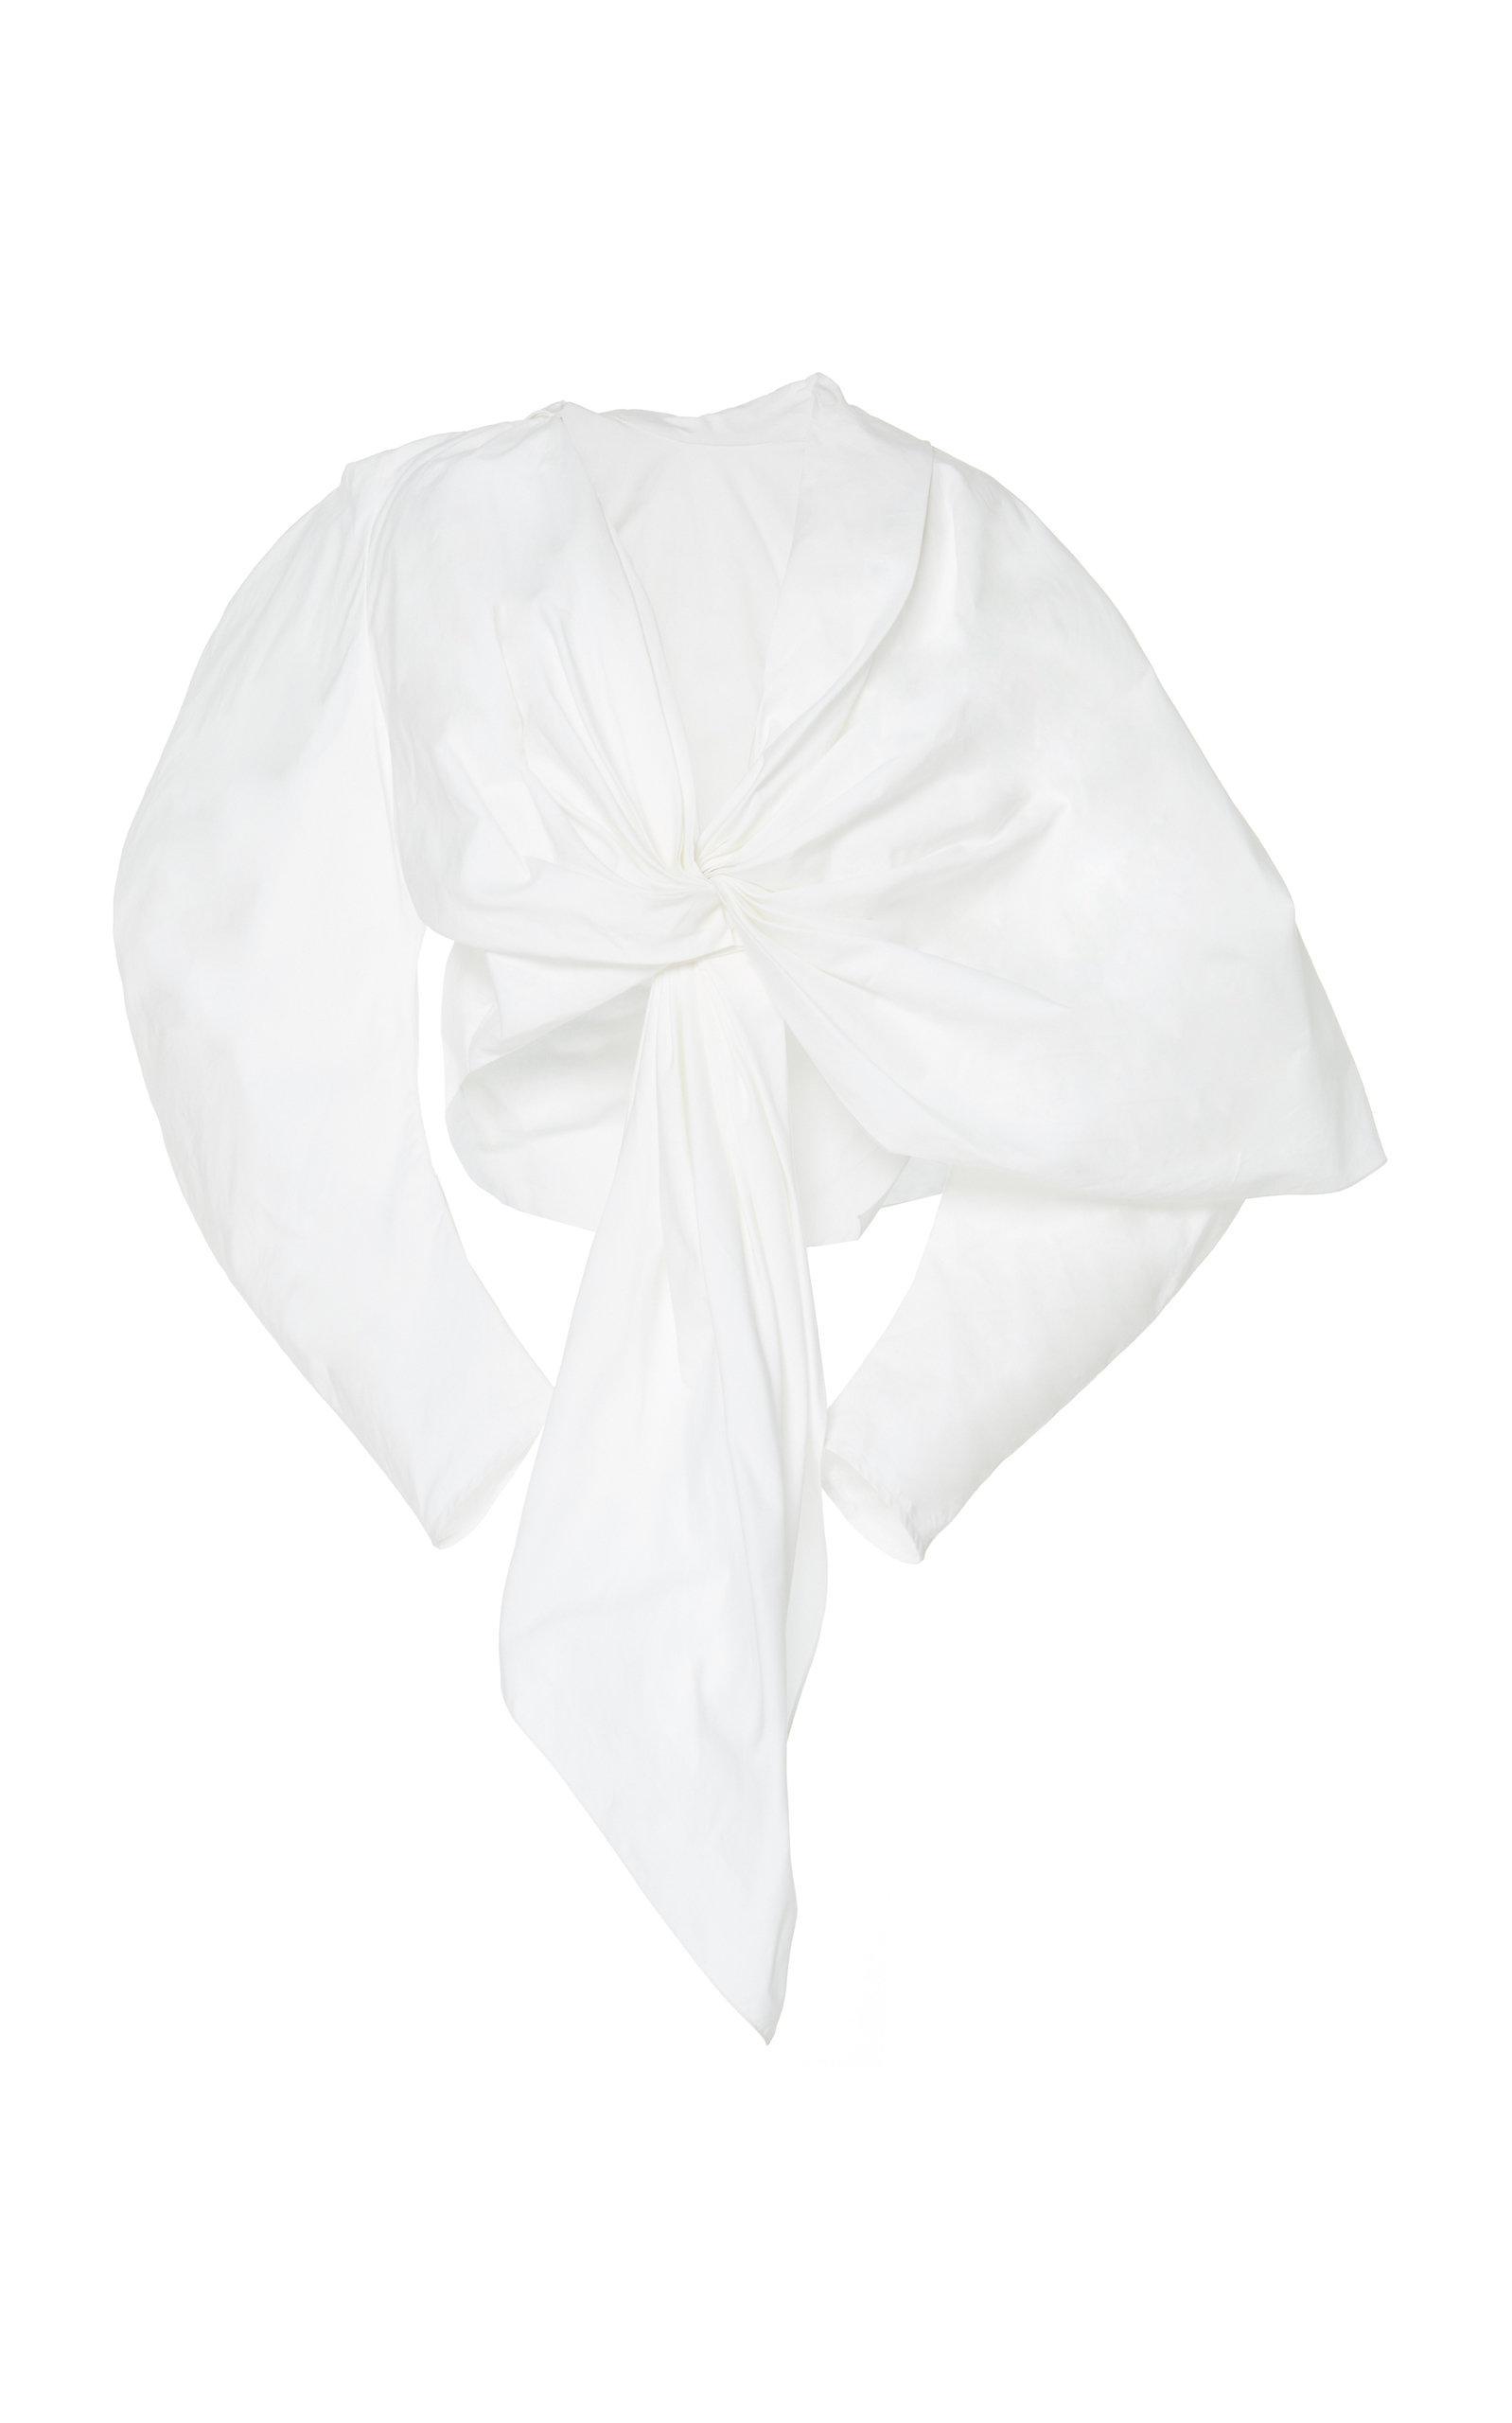 A.w.a.k.e. Reversible Cotton Top In White